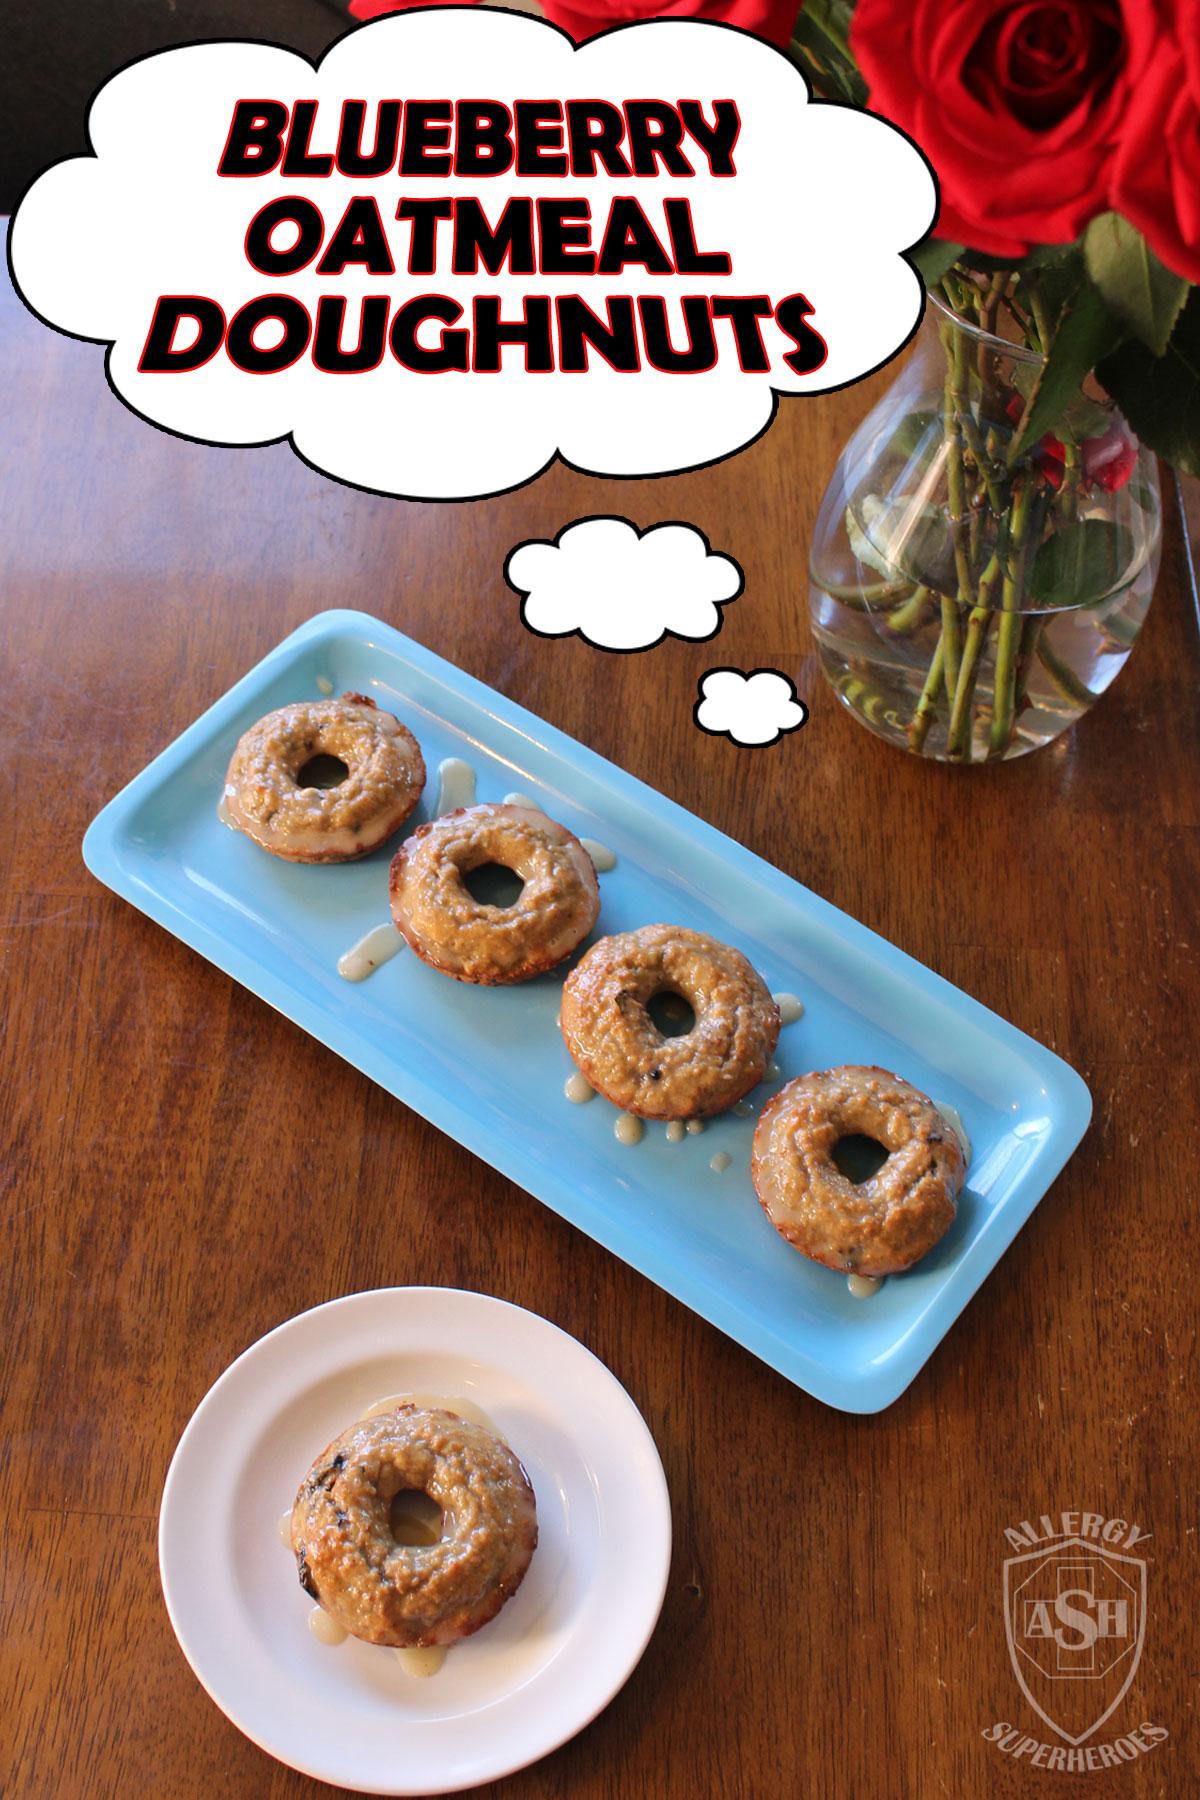 Blueberry Oatmeal Doughnuts